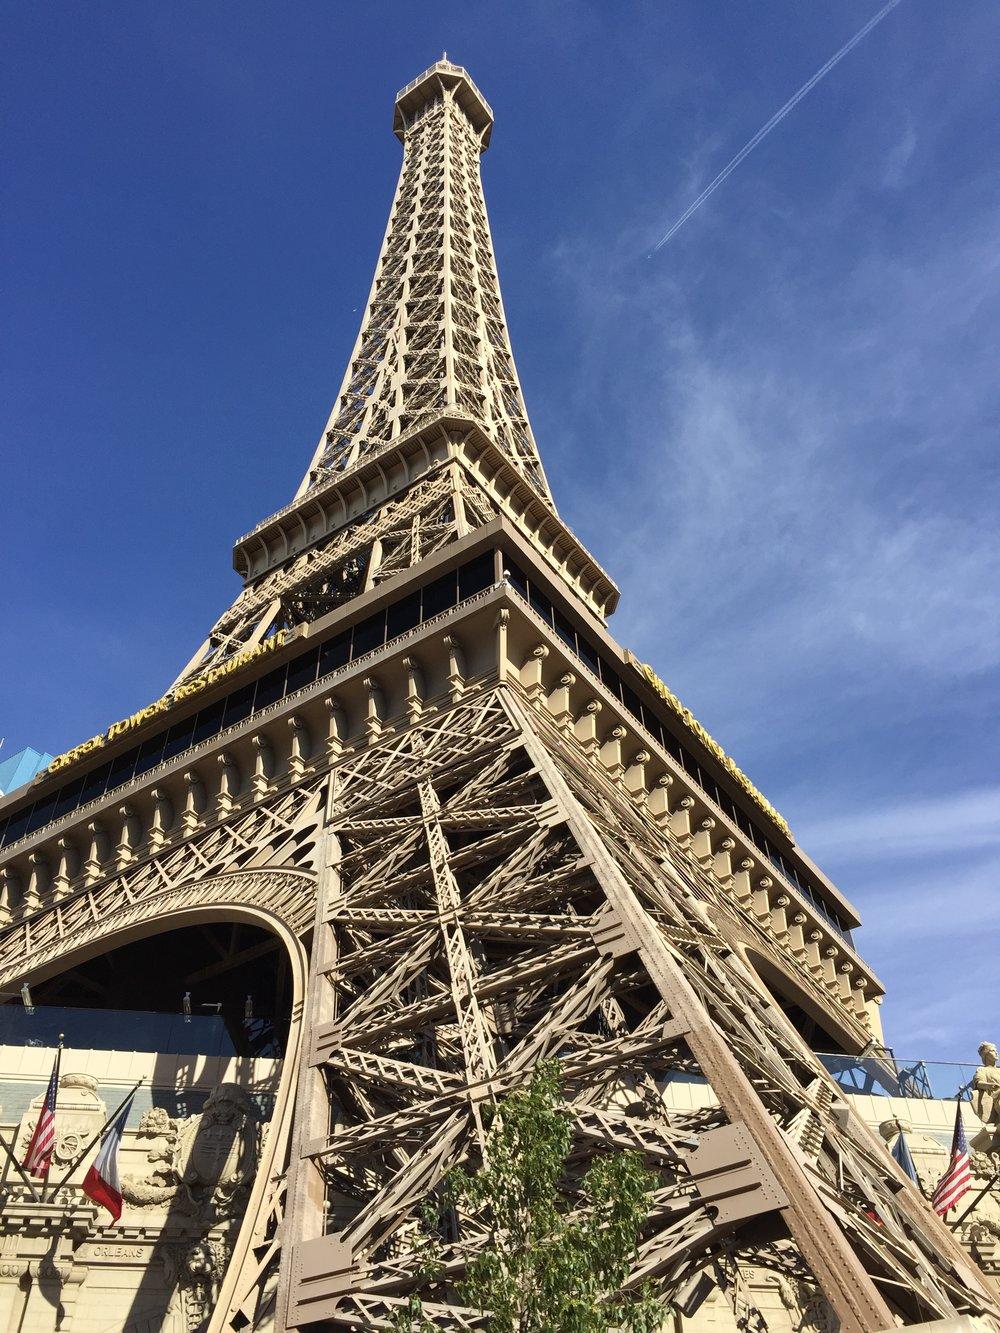 Eiffel Tower, Las Vegas, United States